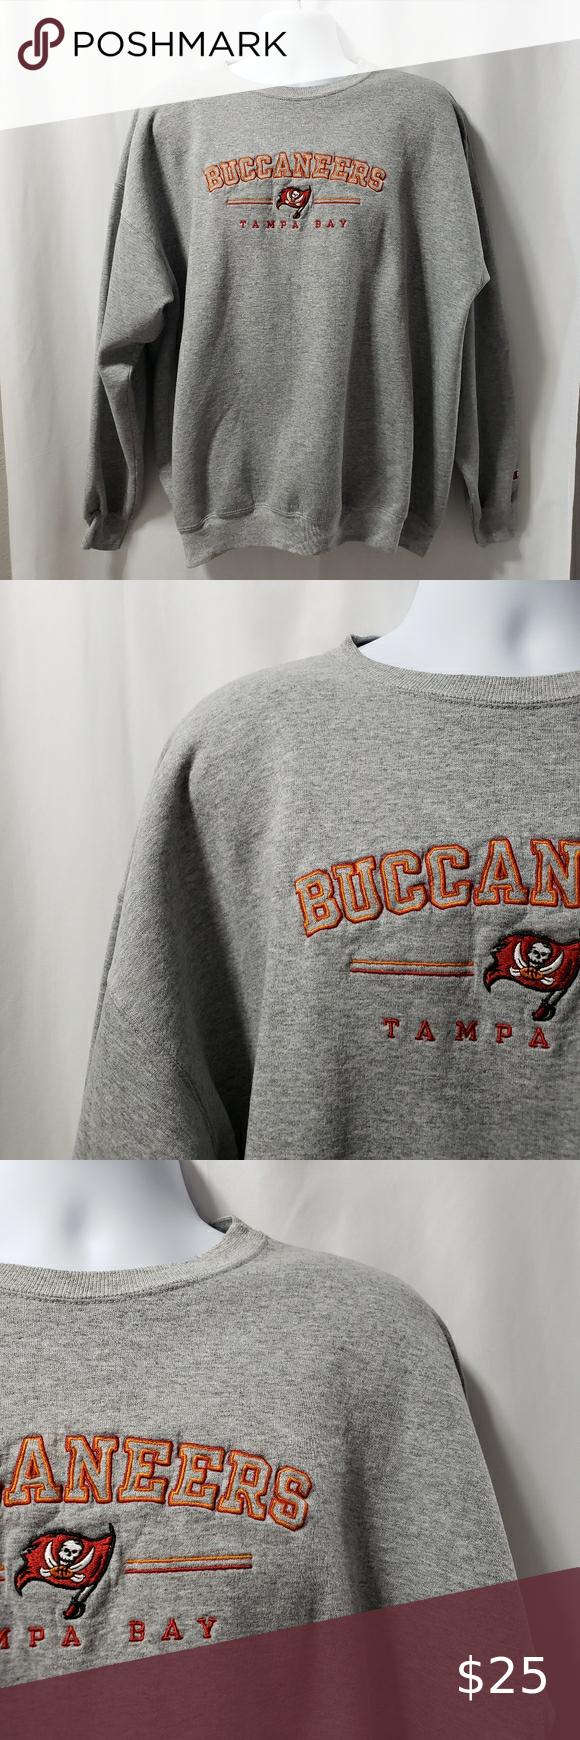 Retro Champion Crewneck Tampa Bay Bucs Nfl Xl Vintage Crewneck Sweatshirt Champion Crewneck Vintage Sweatshirt [ 1740 x 580 Pixel ]